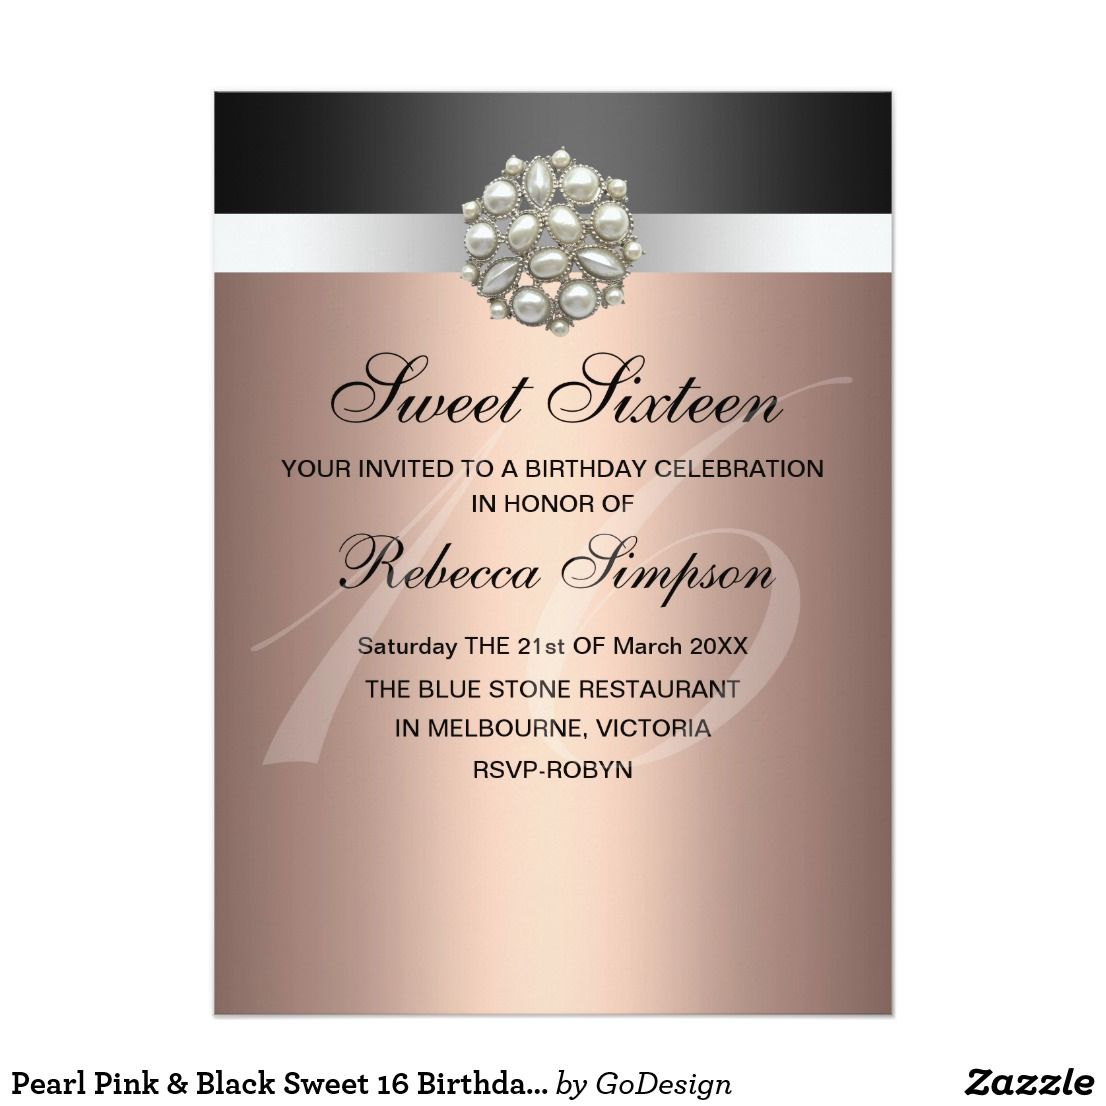 Pearl Pink & Black Sweet 16 Birthday Invitation   Sweet 16 birthday ...